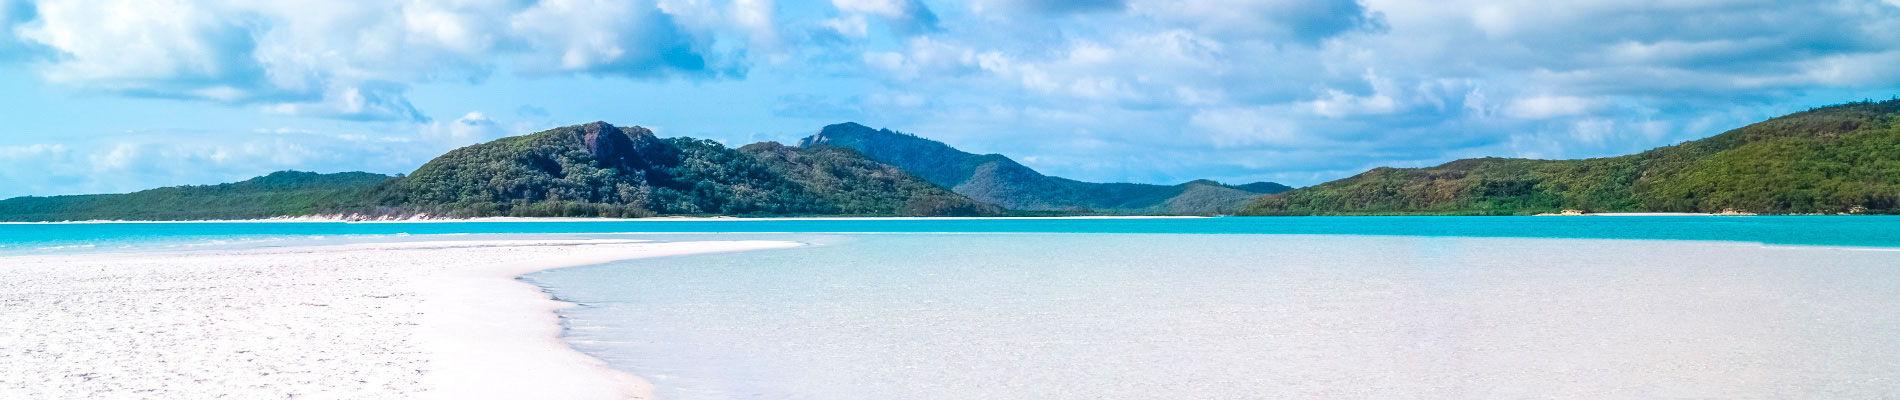 australie-whitehaven-beach-st